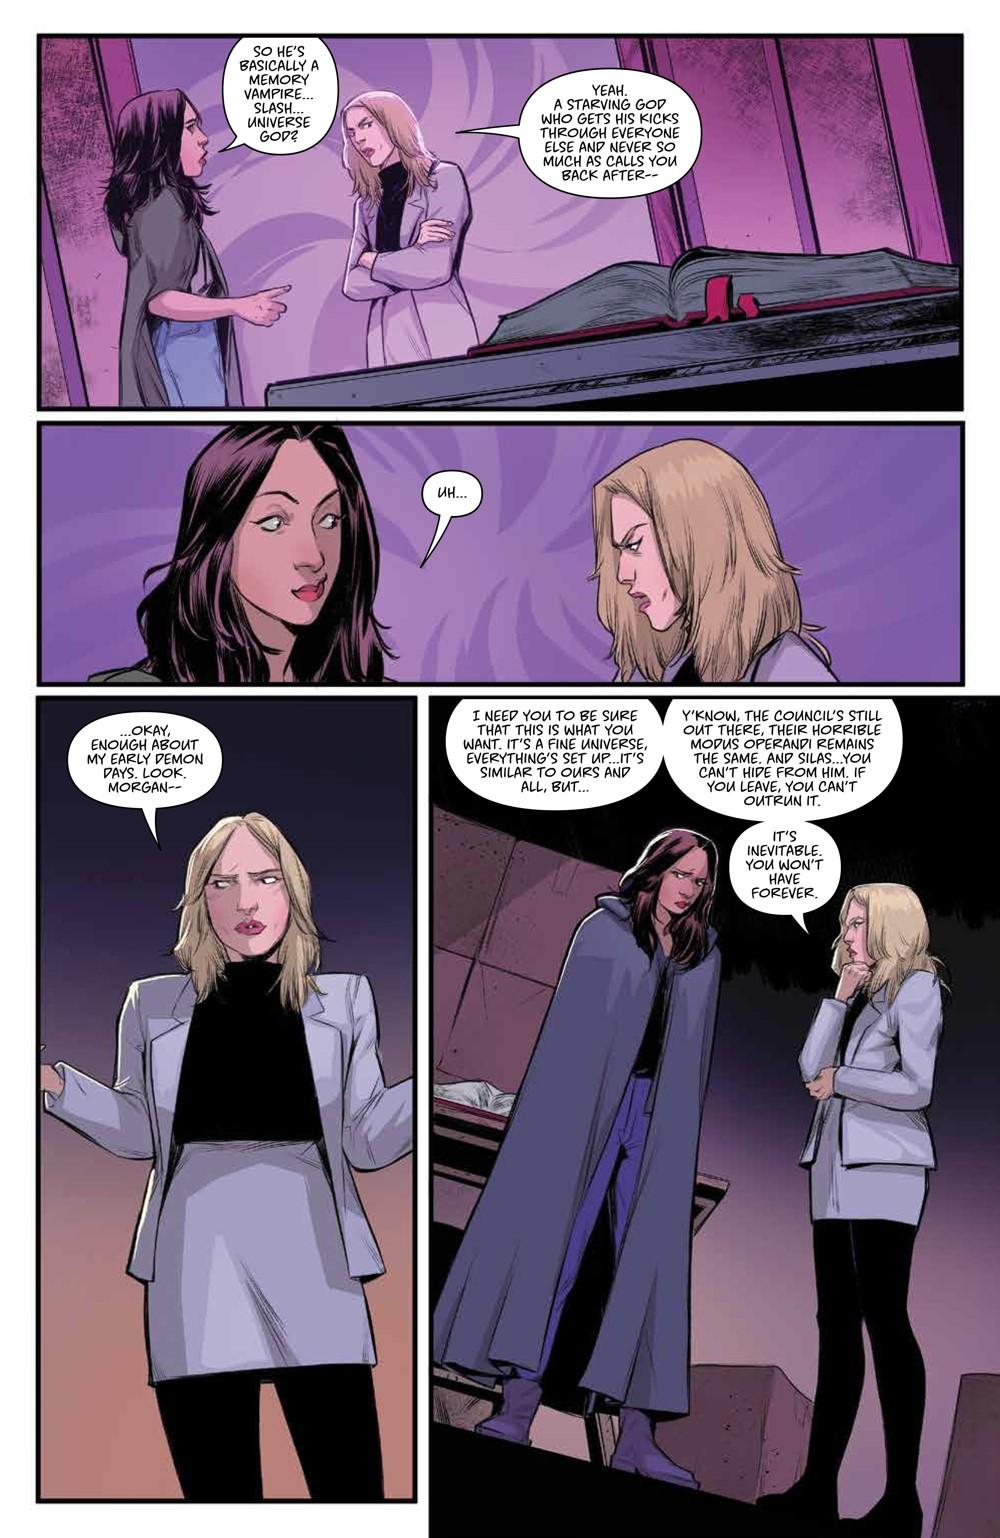 Buffy_028_PRESS_8 ComicList Previews: BUFFY THE VAMPIRE SLAYER #28